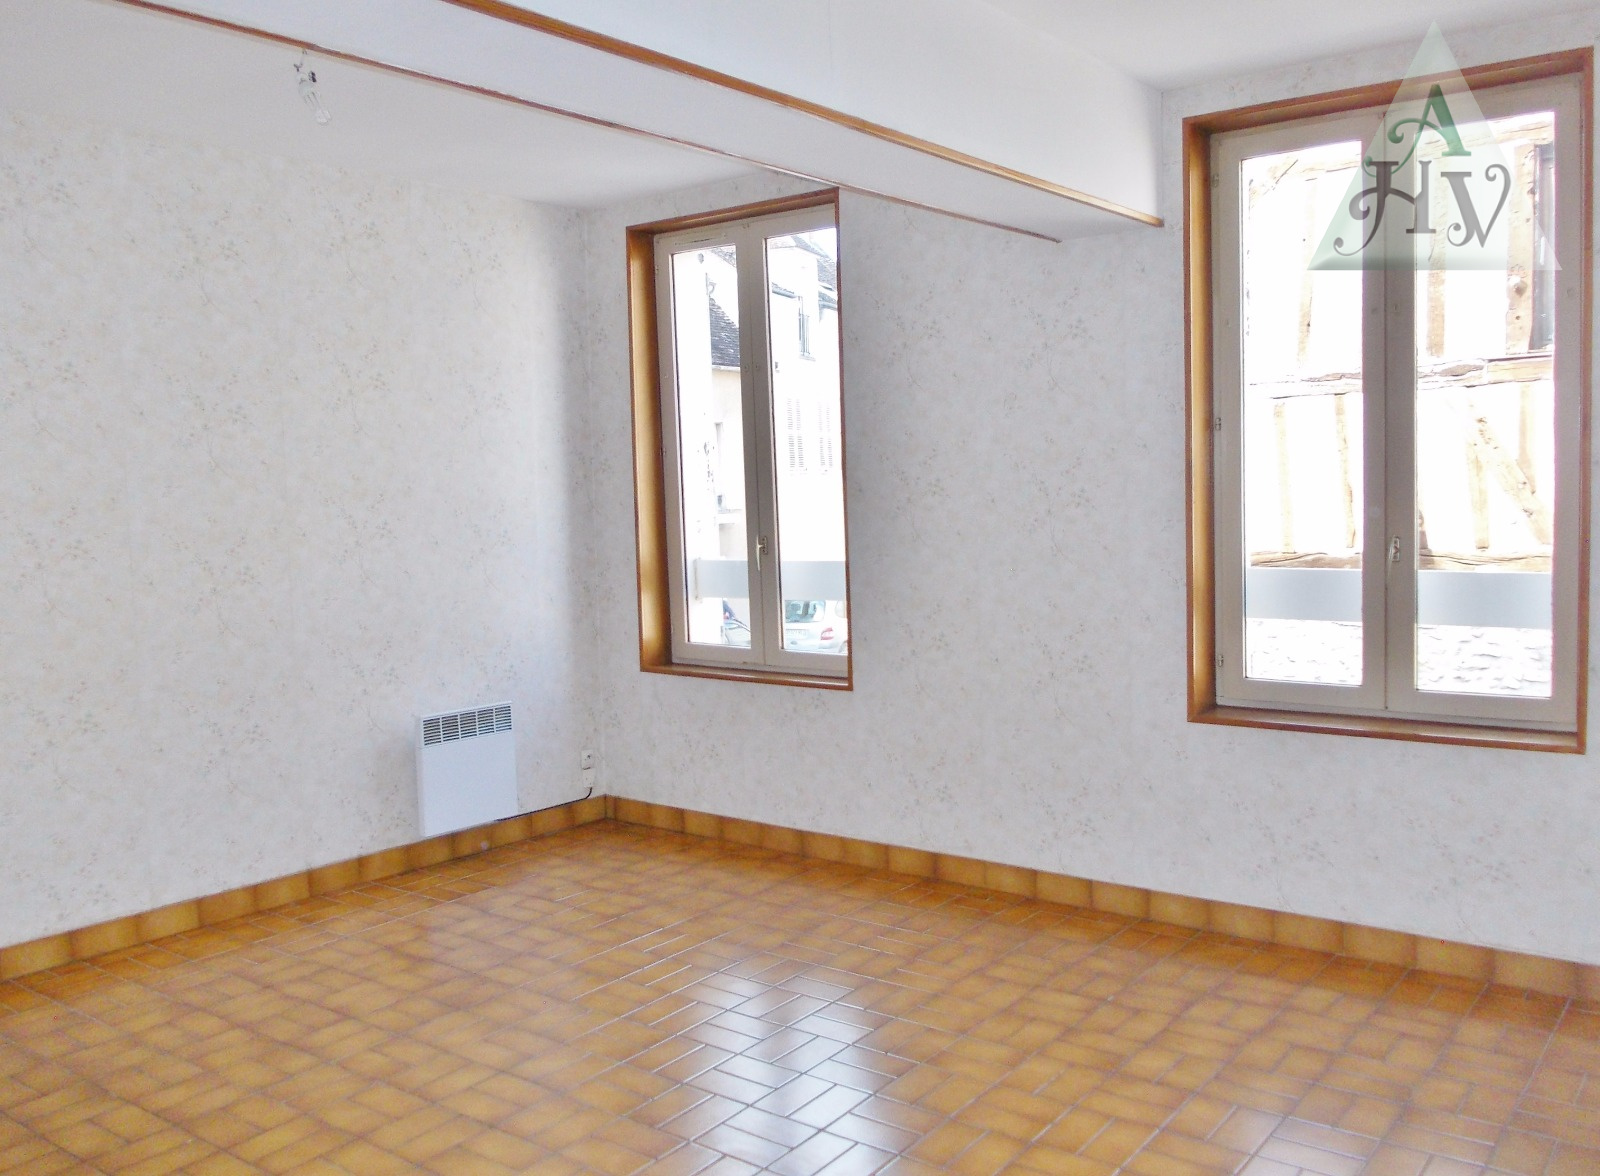 Vente appartement de type f2 for Vente appartement f2